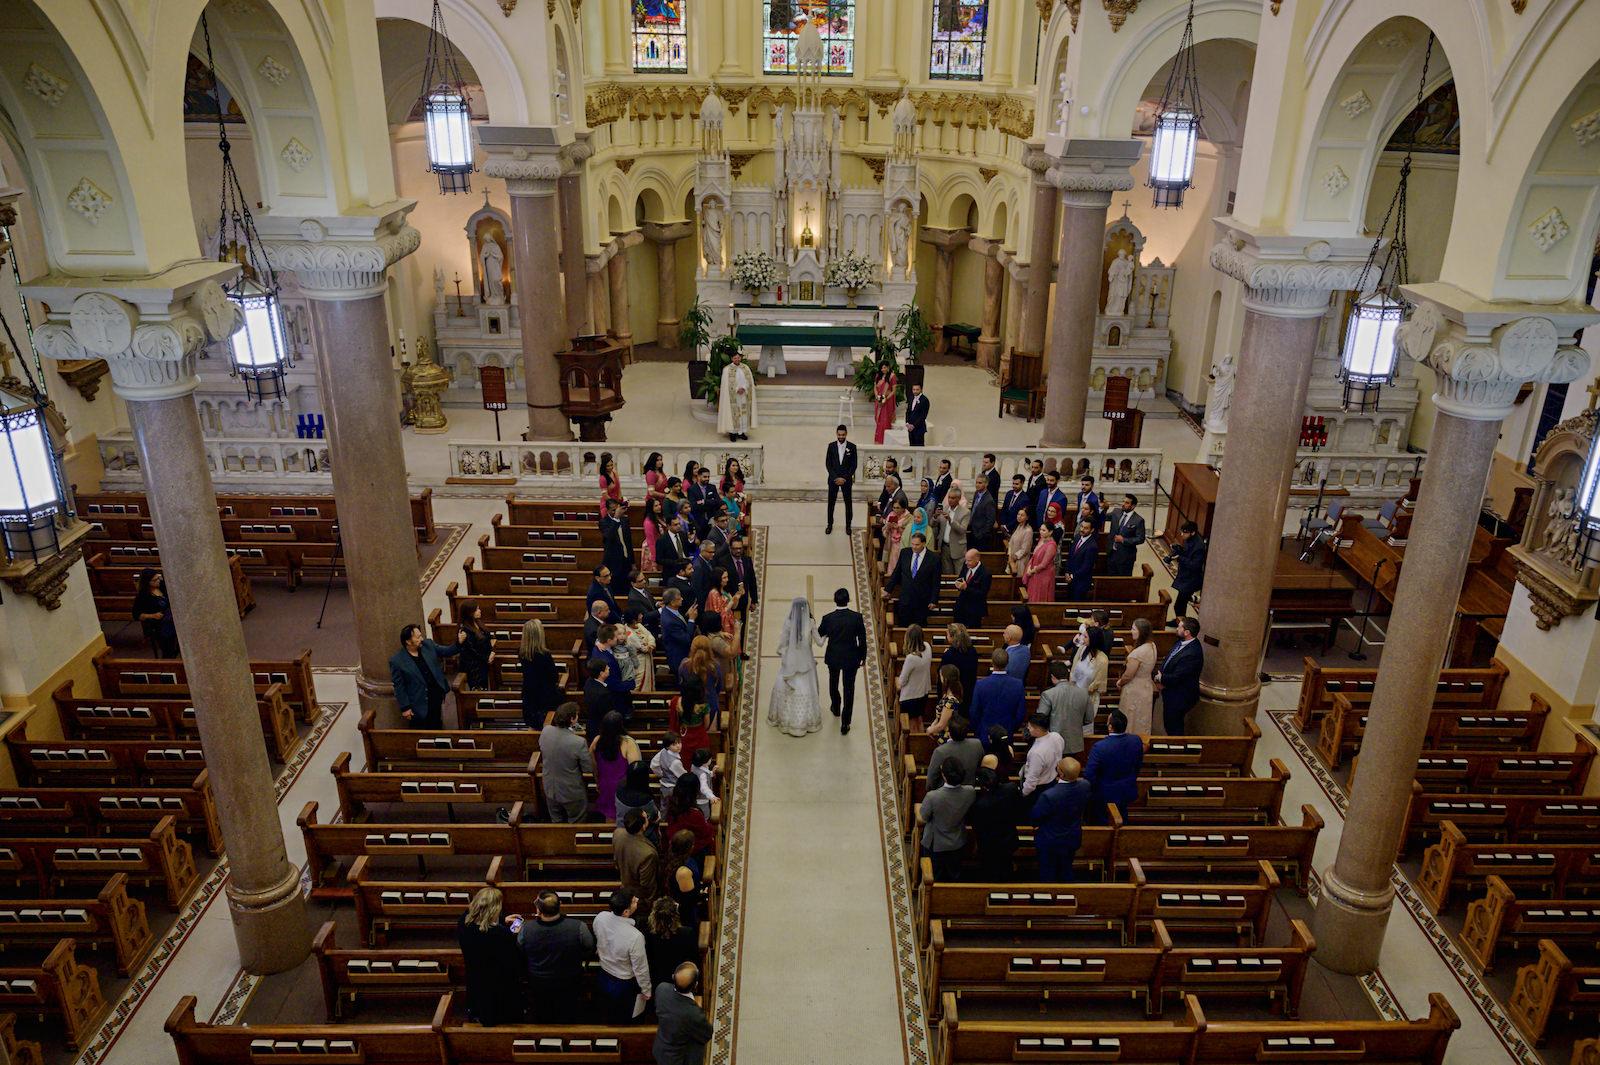 Florida Bride and Father Walk Down the Aisle, Birds Eye View of Catholic Wedding Ceremony at Sacred Heart Catholic Church